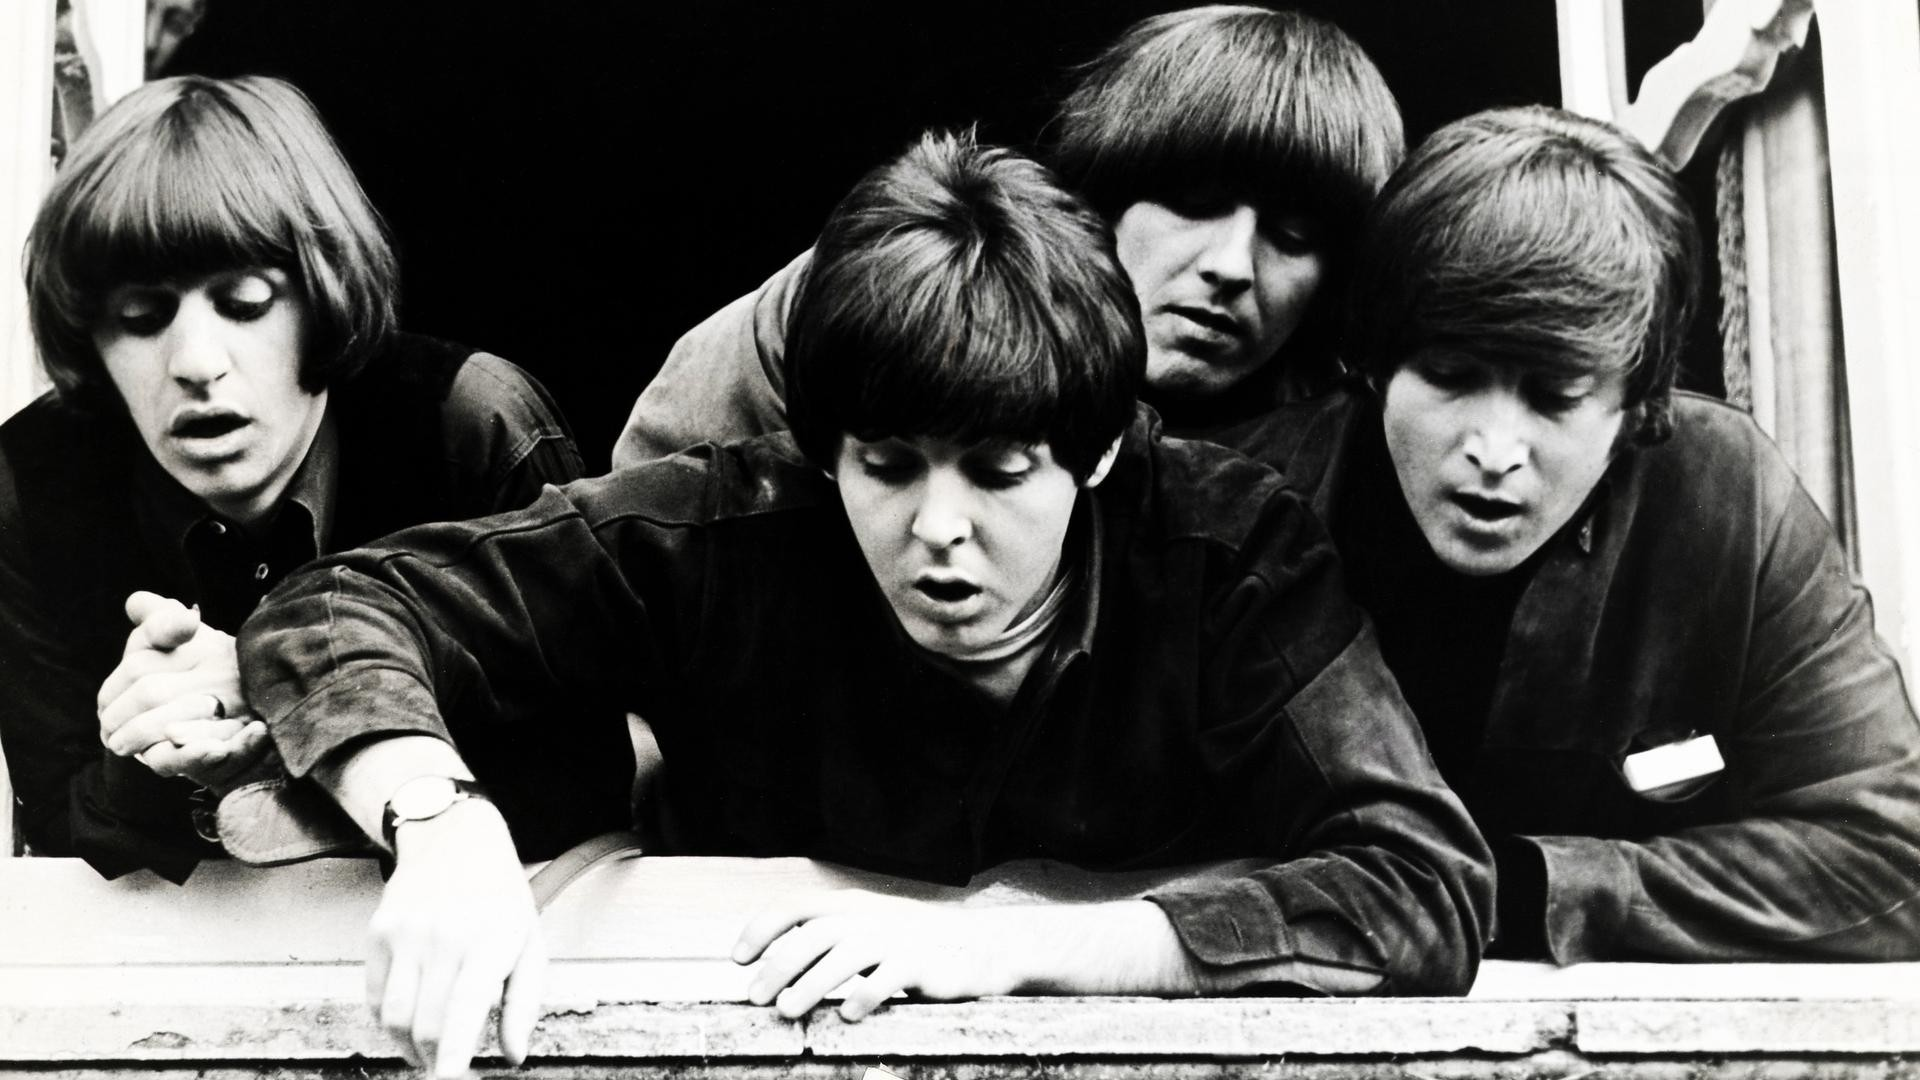 The Beatles Monochrome Paul McCartney John Lennon George Harrison Ringo  Starr